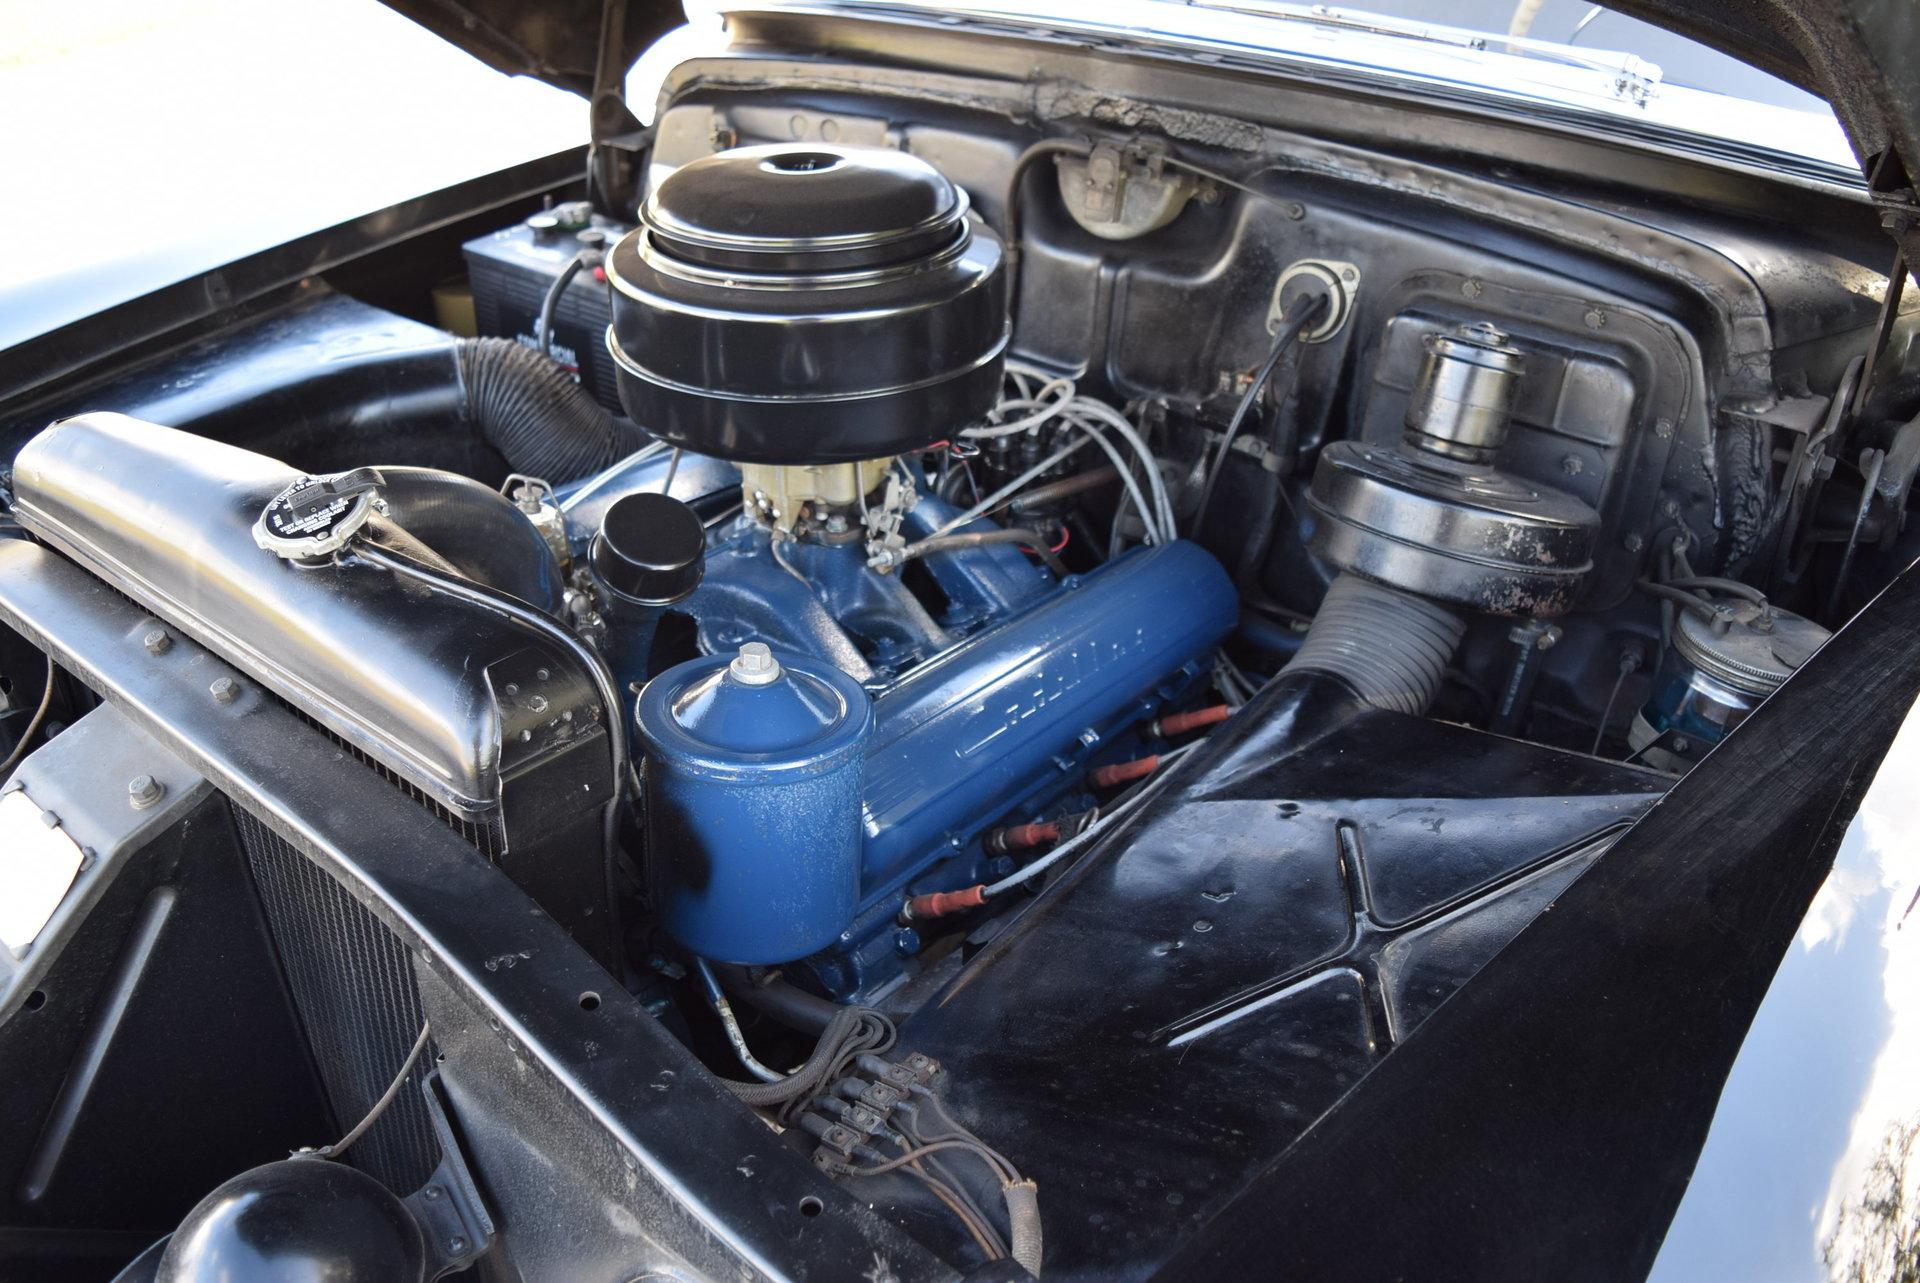 1951 Cadillac Fleetwood 75 Limousine | Orlando Classic Cars